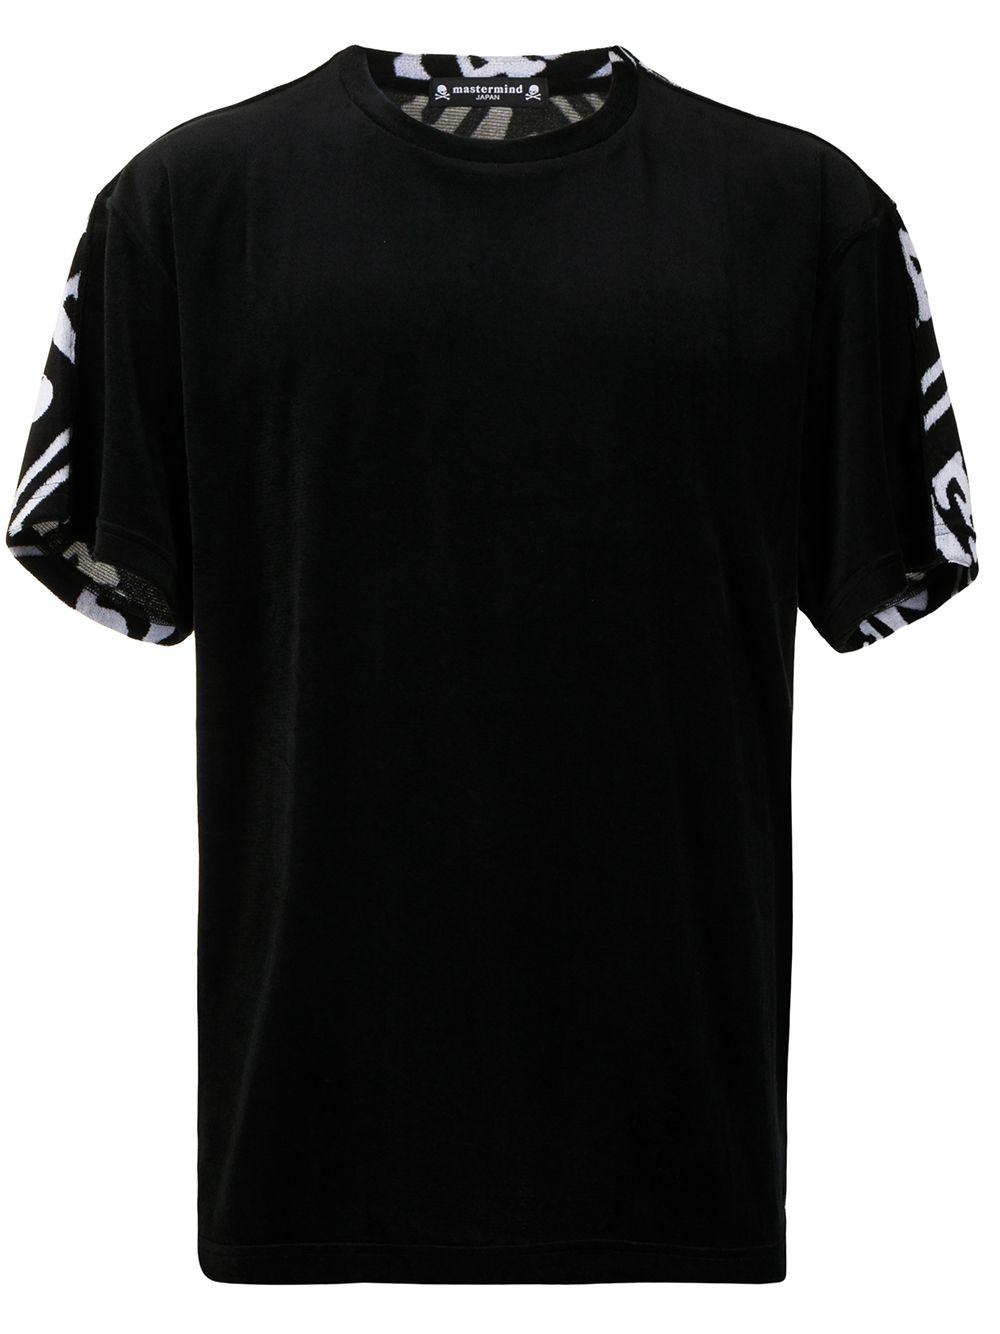 Mastermind Japan T-Shirt in Velours-Optik - Schwarz